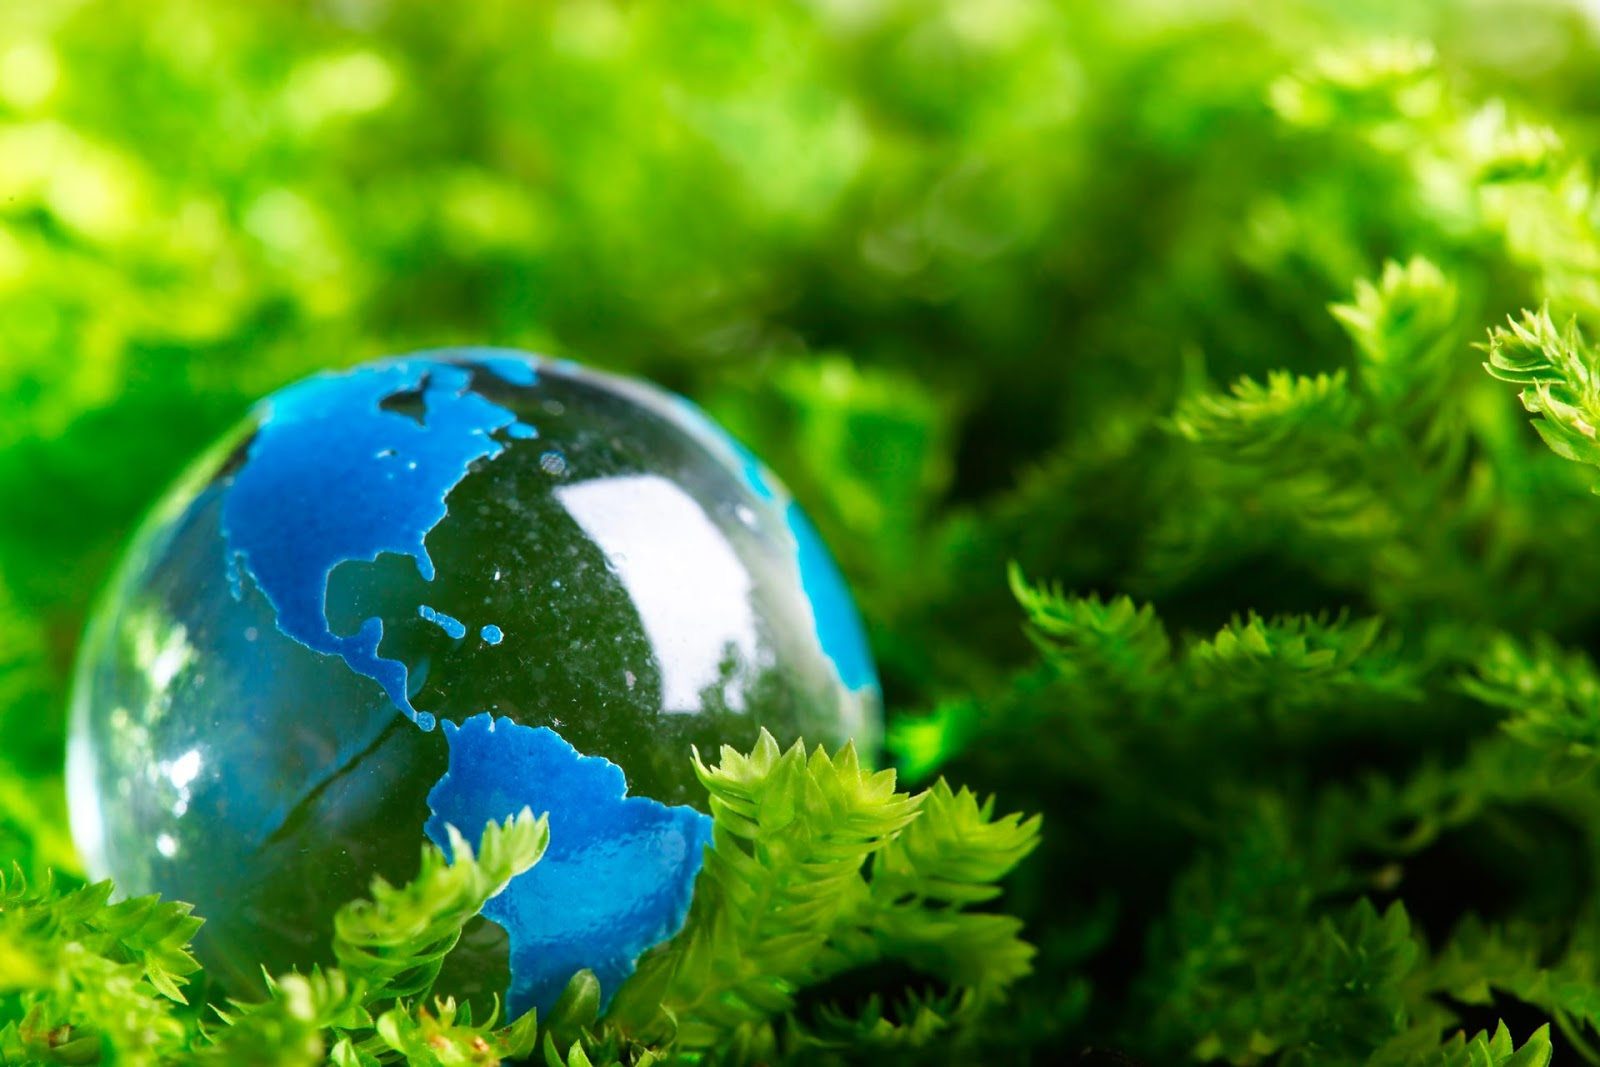 Manfaat Sertifikasi ISO 14001 Bagi Perusahaan